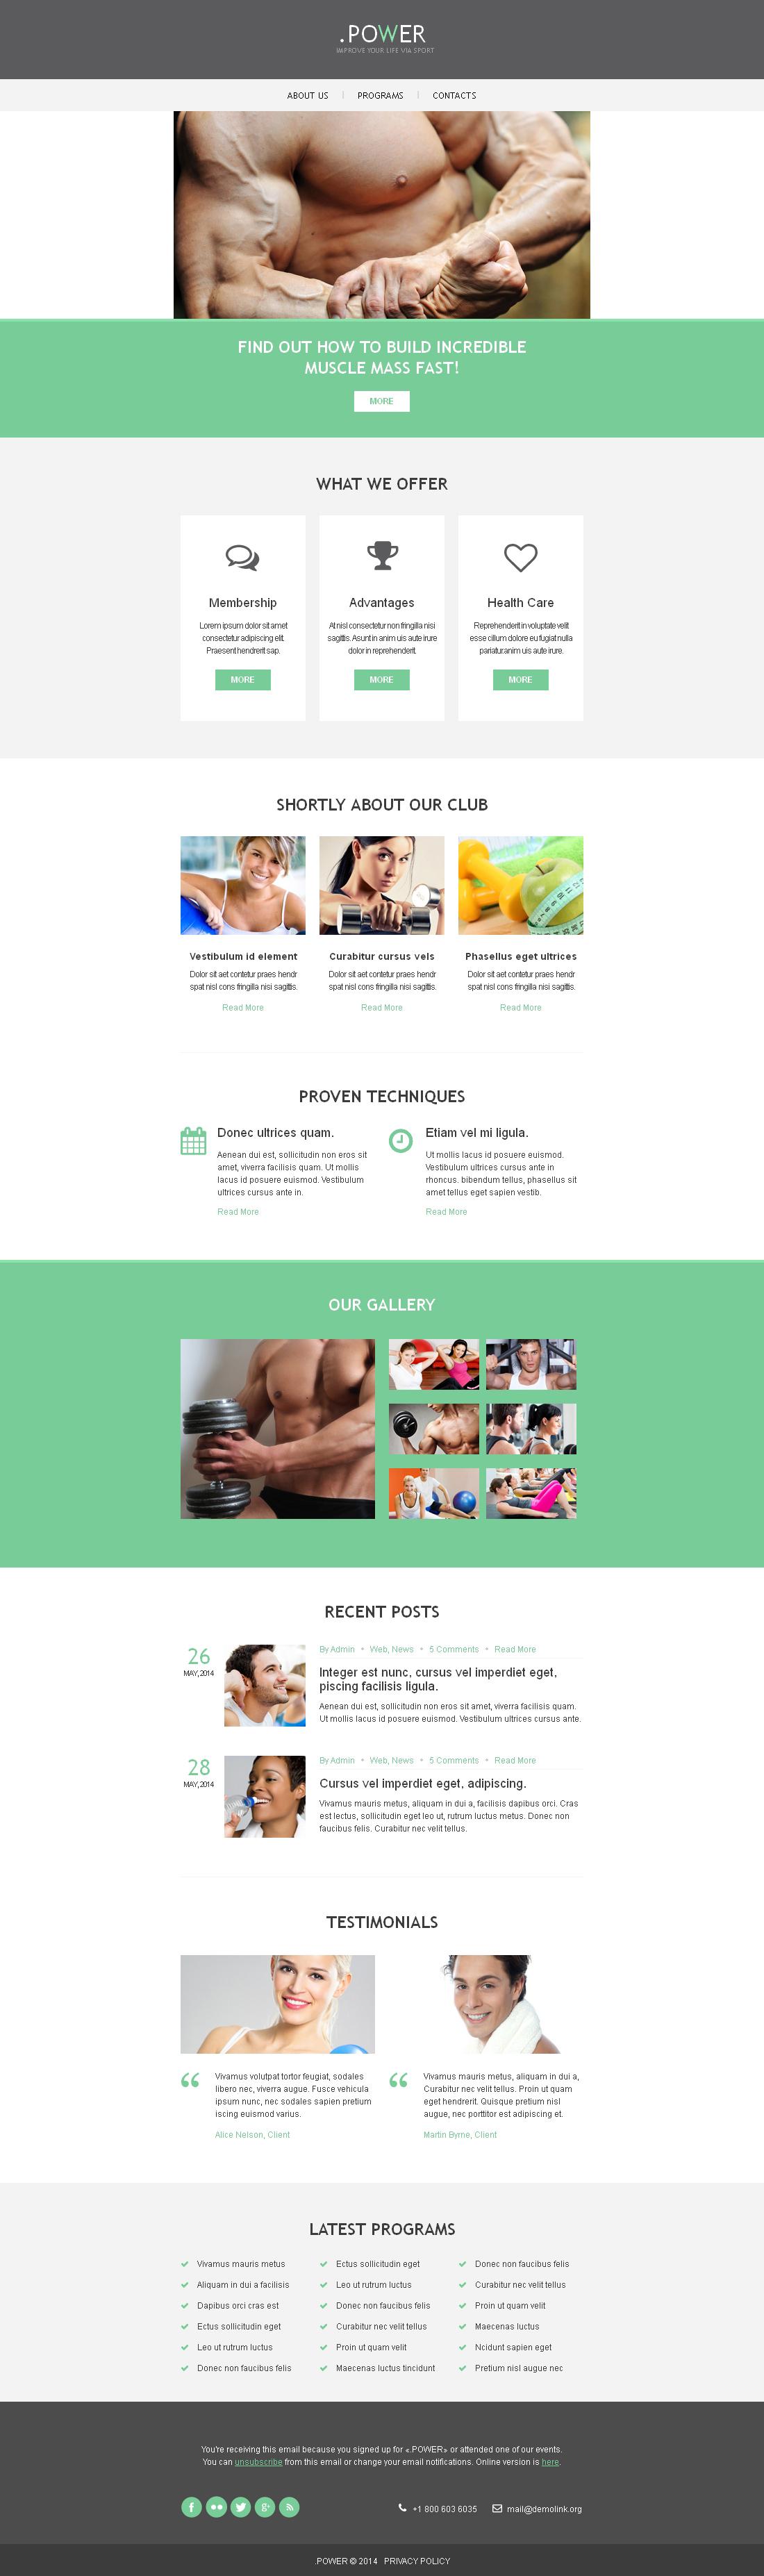 Адаптивний Шаблон E-mail розсилки на тему bodybuilding templates №49266